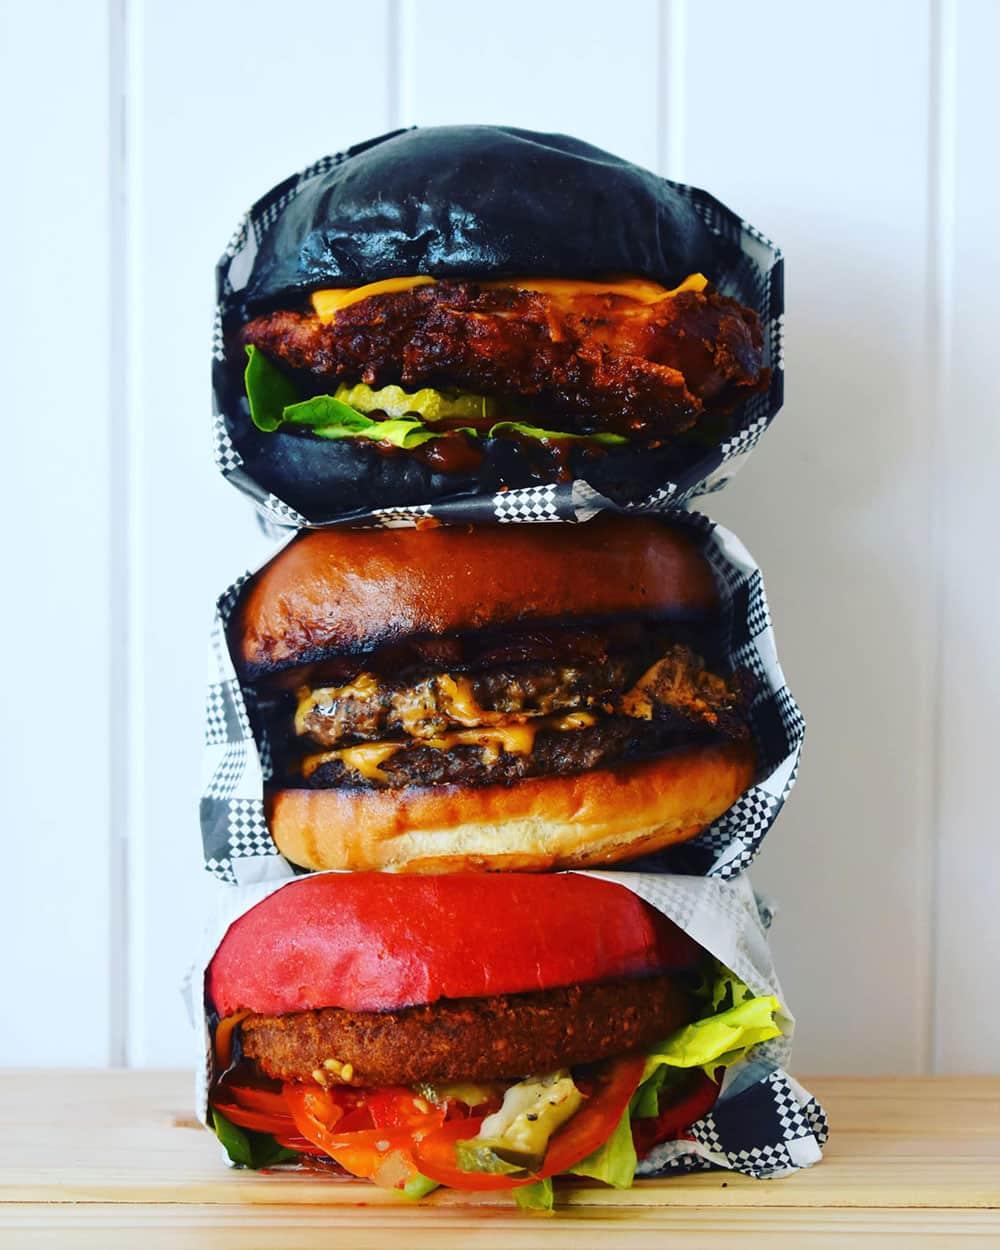 Mr Bentley Rye burgers